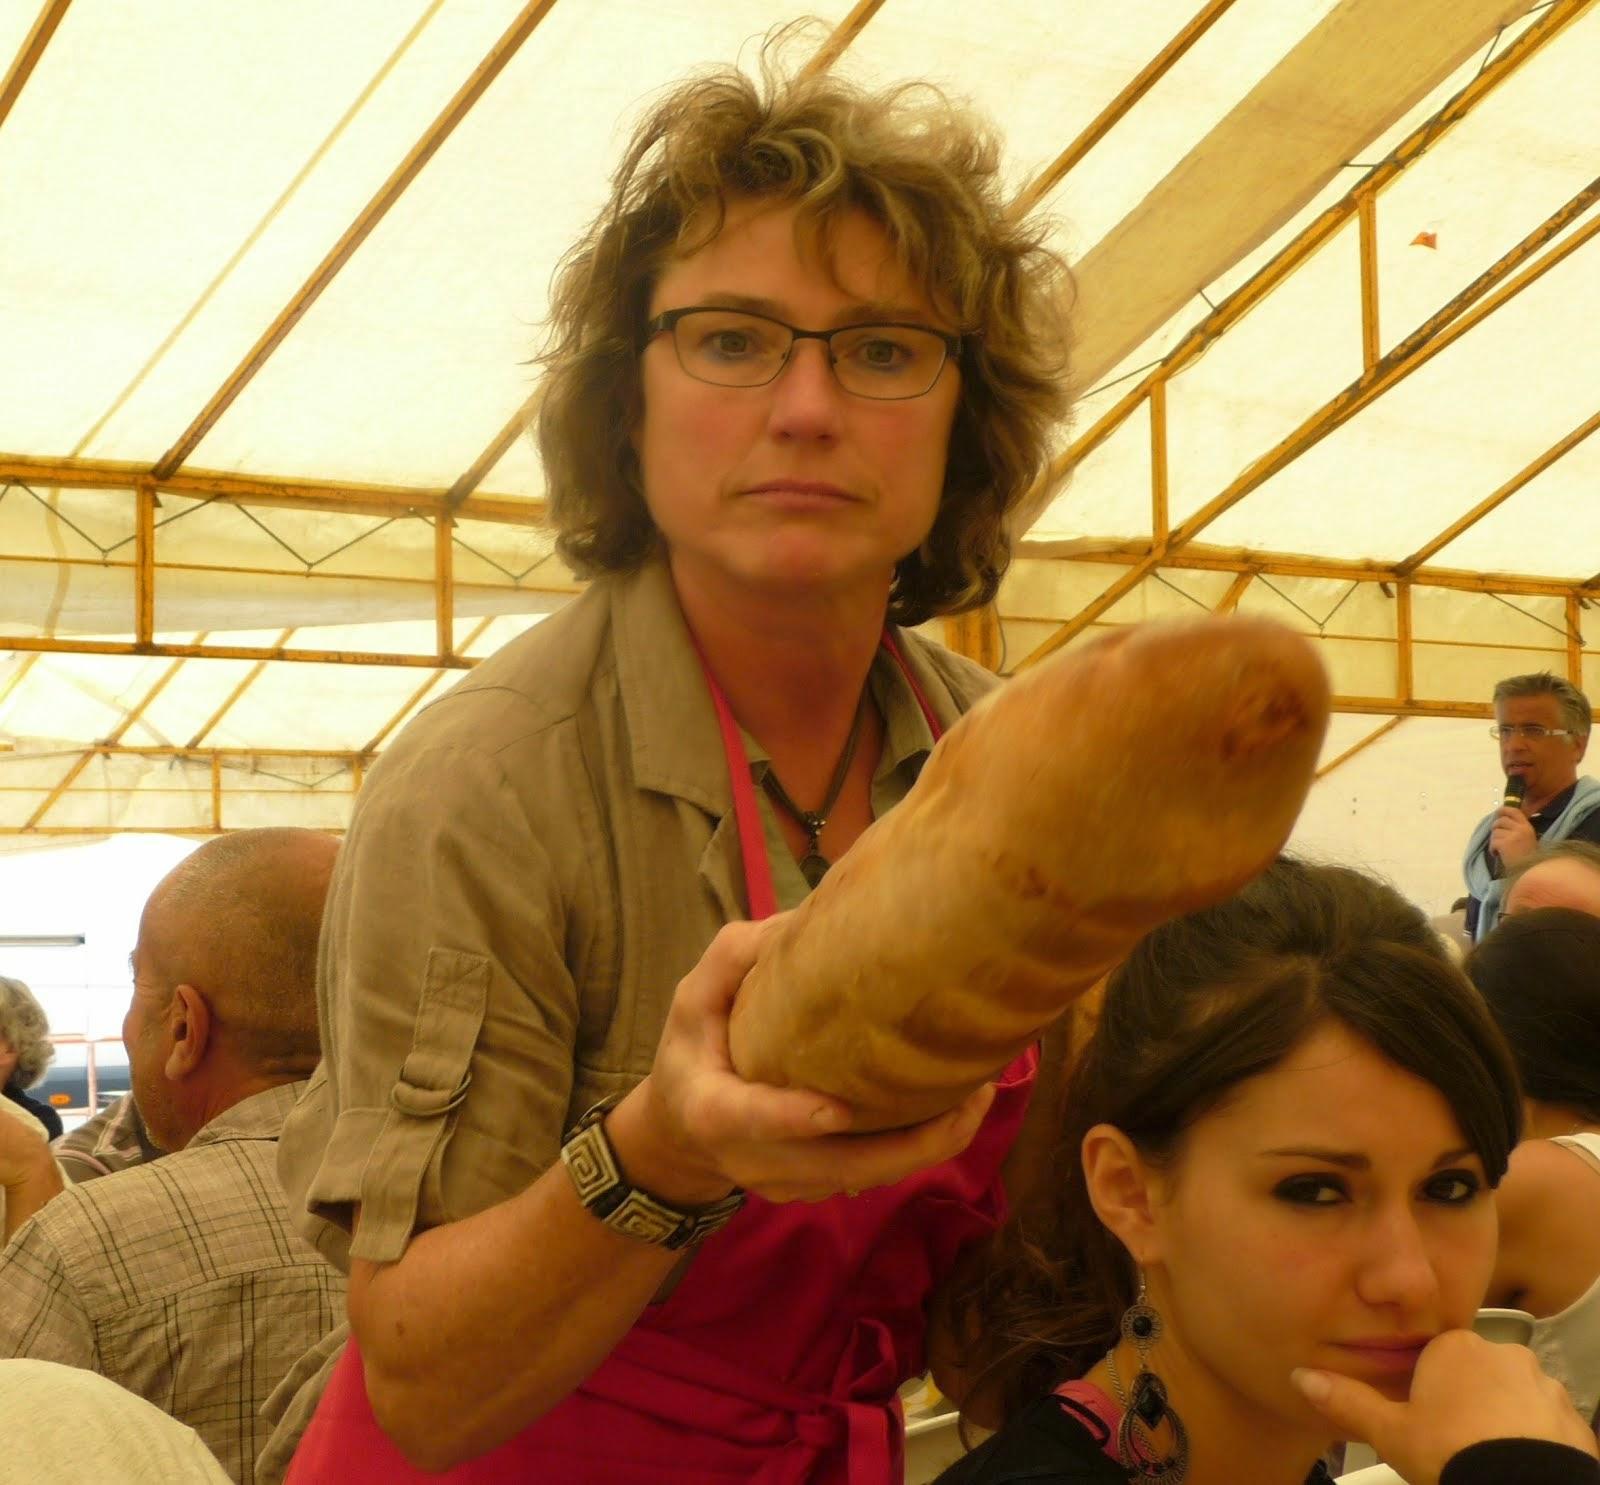 Your bread monsieur! Big enough?